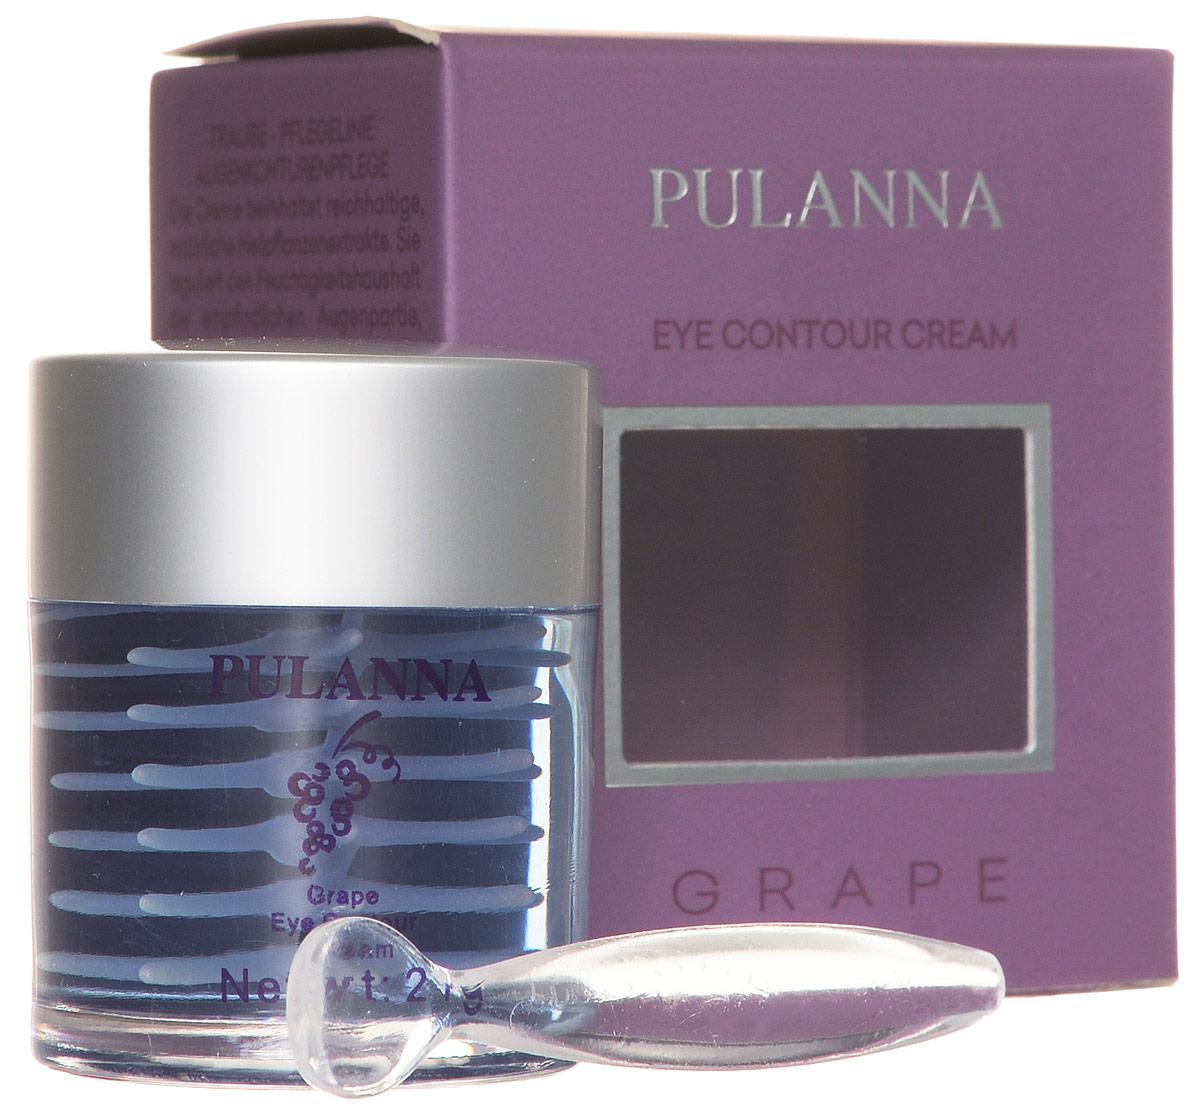 Pulanna Крем для контура глаз на основе винограда - Eye Contour Cream 21 г